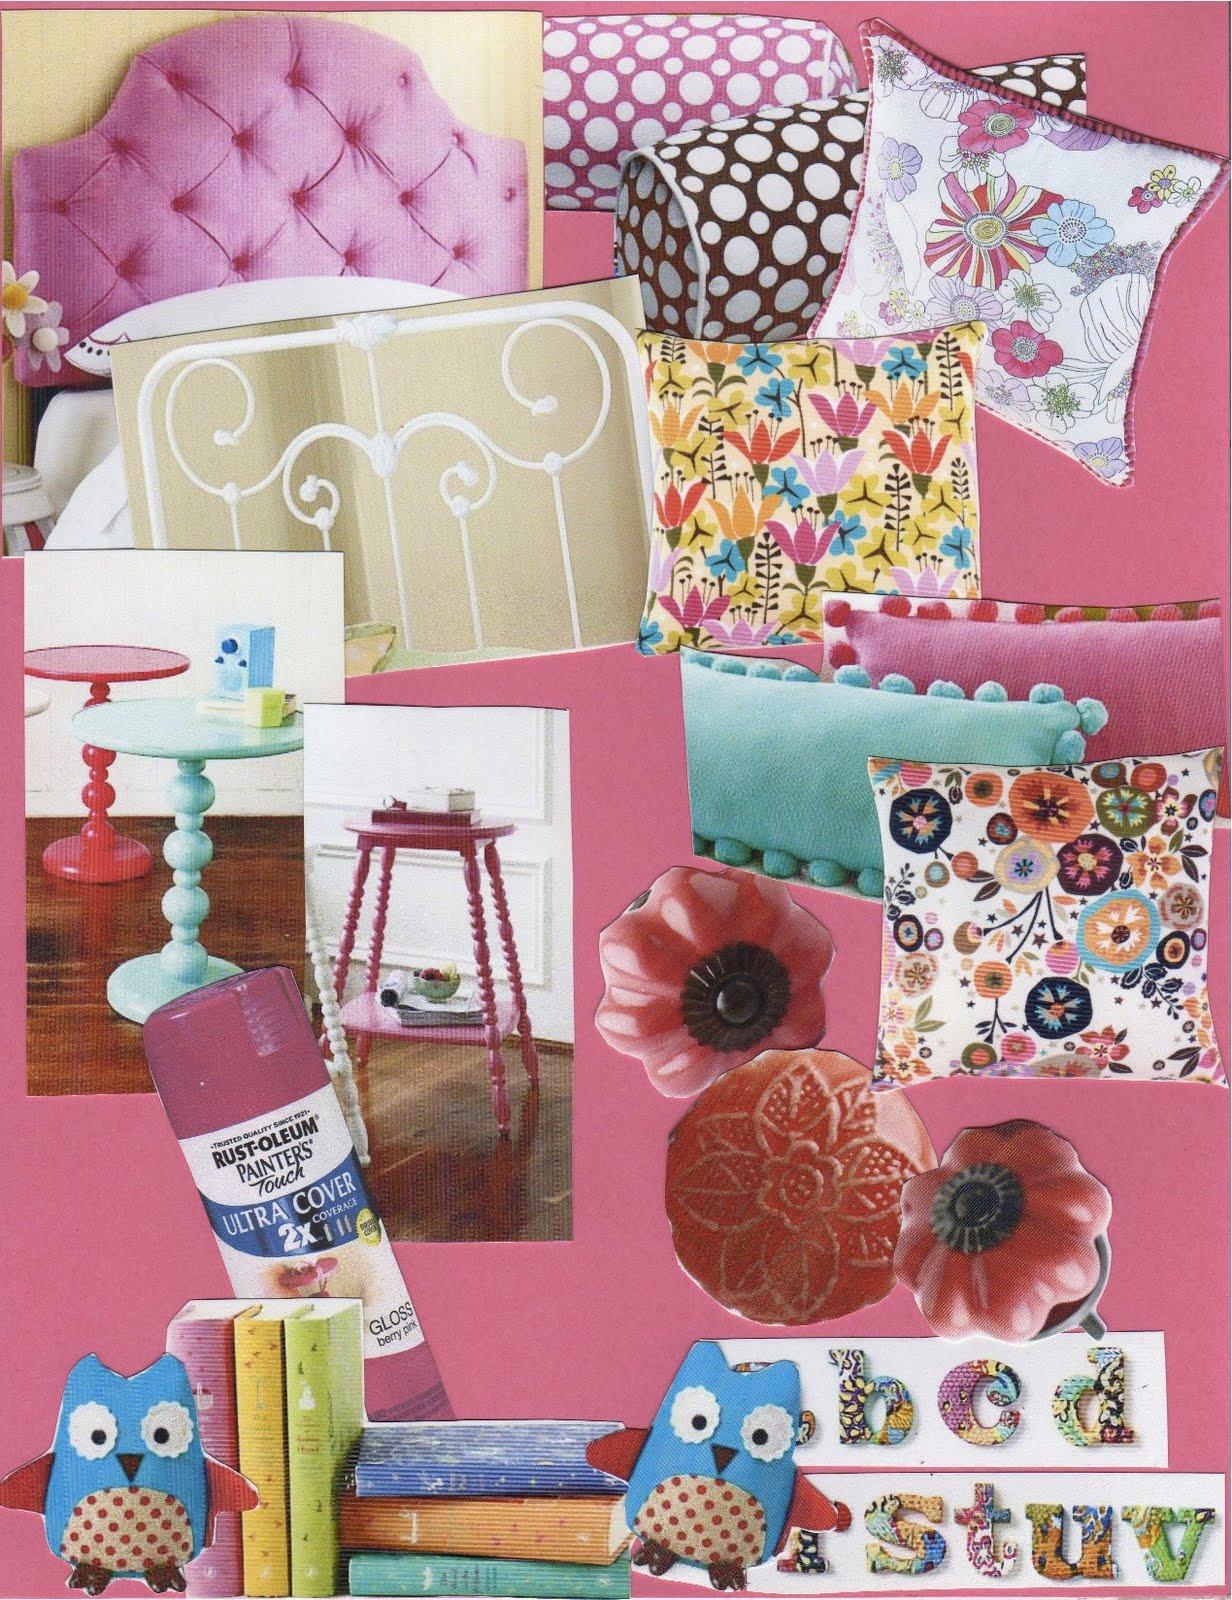 51 Inspiring Bohemian Living Room Designs: Inspiring Bohemian Living Room Designs